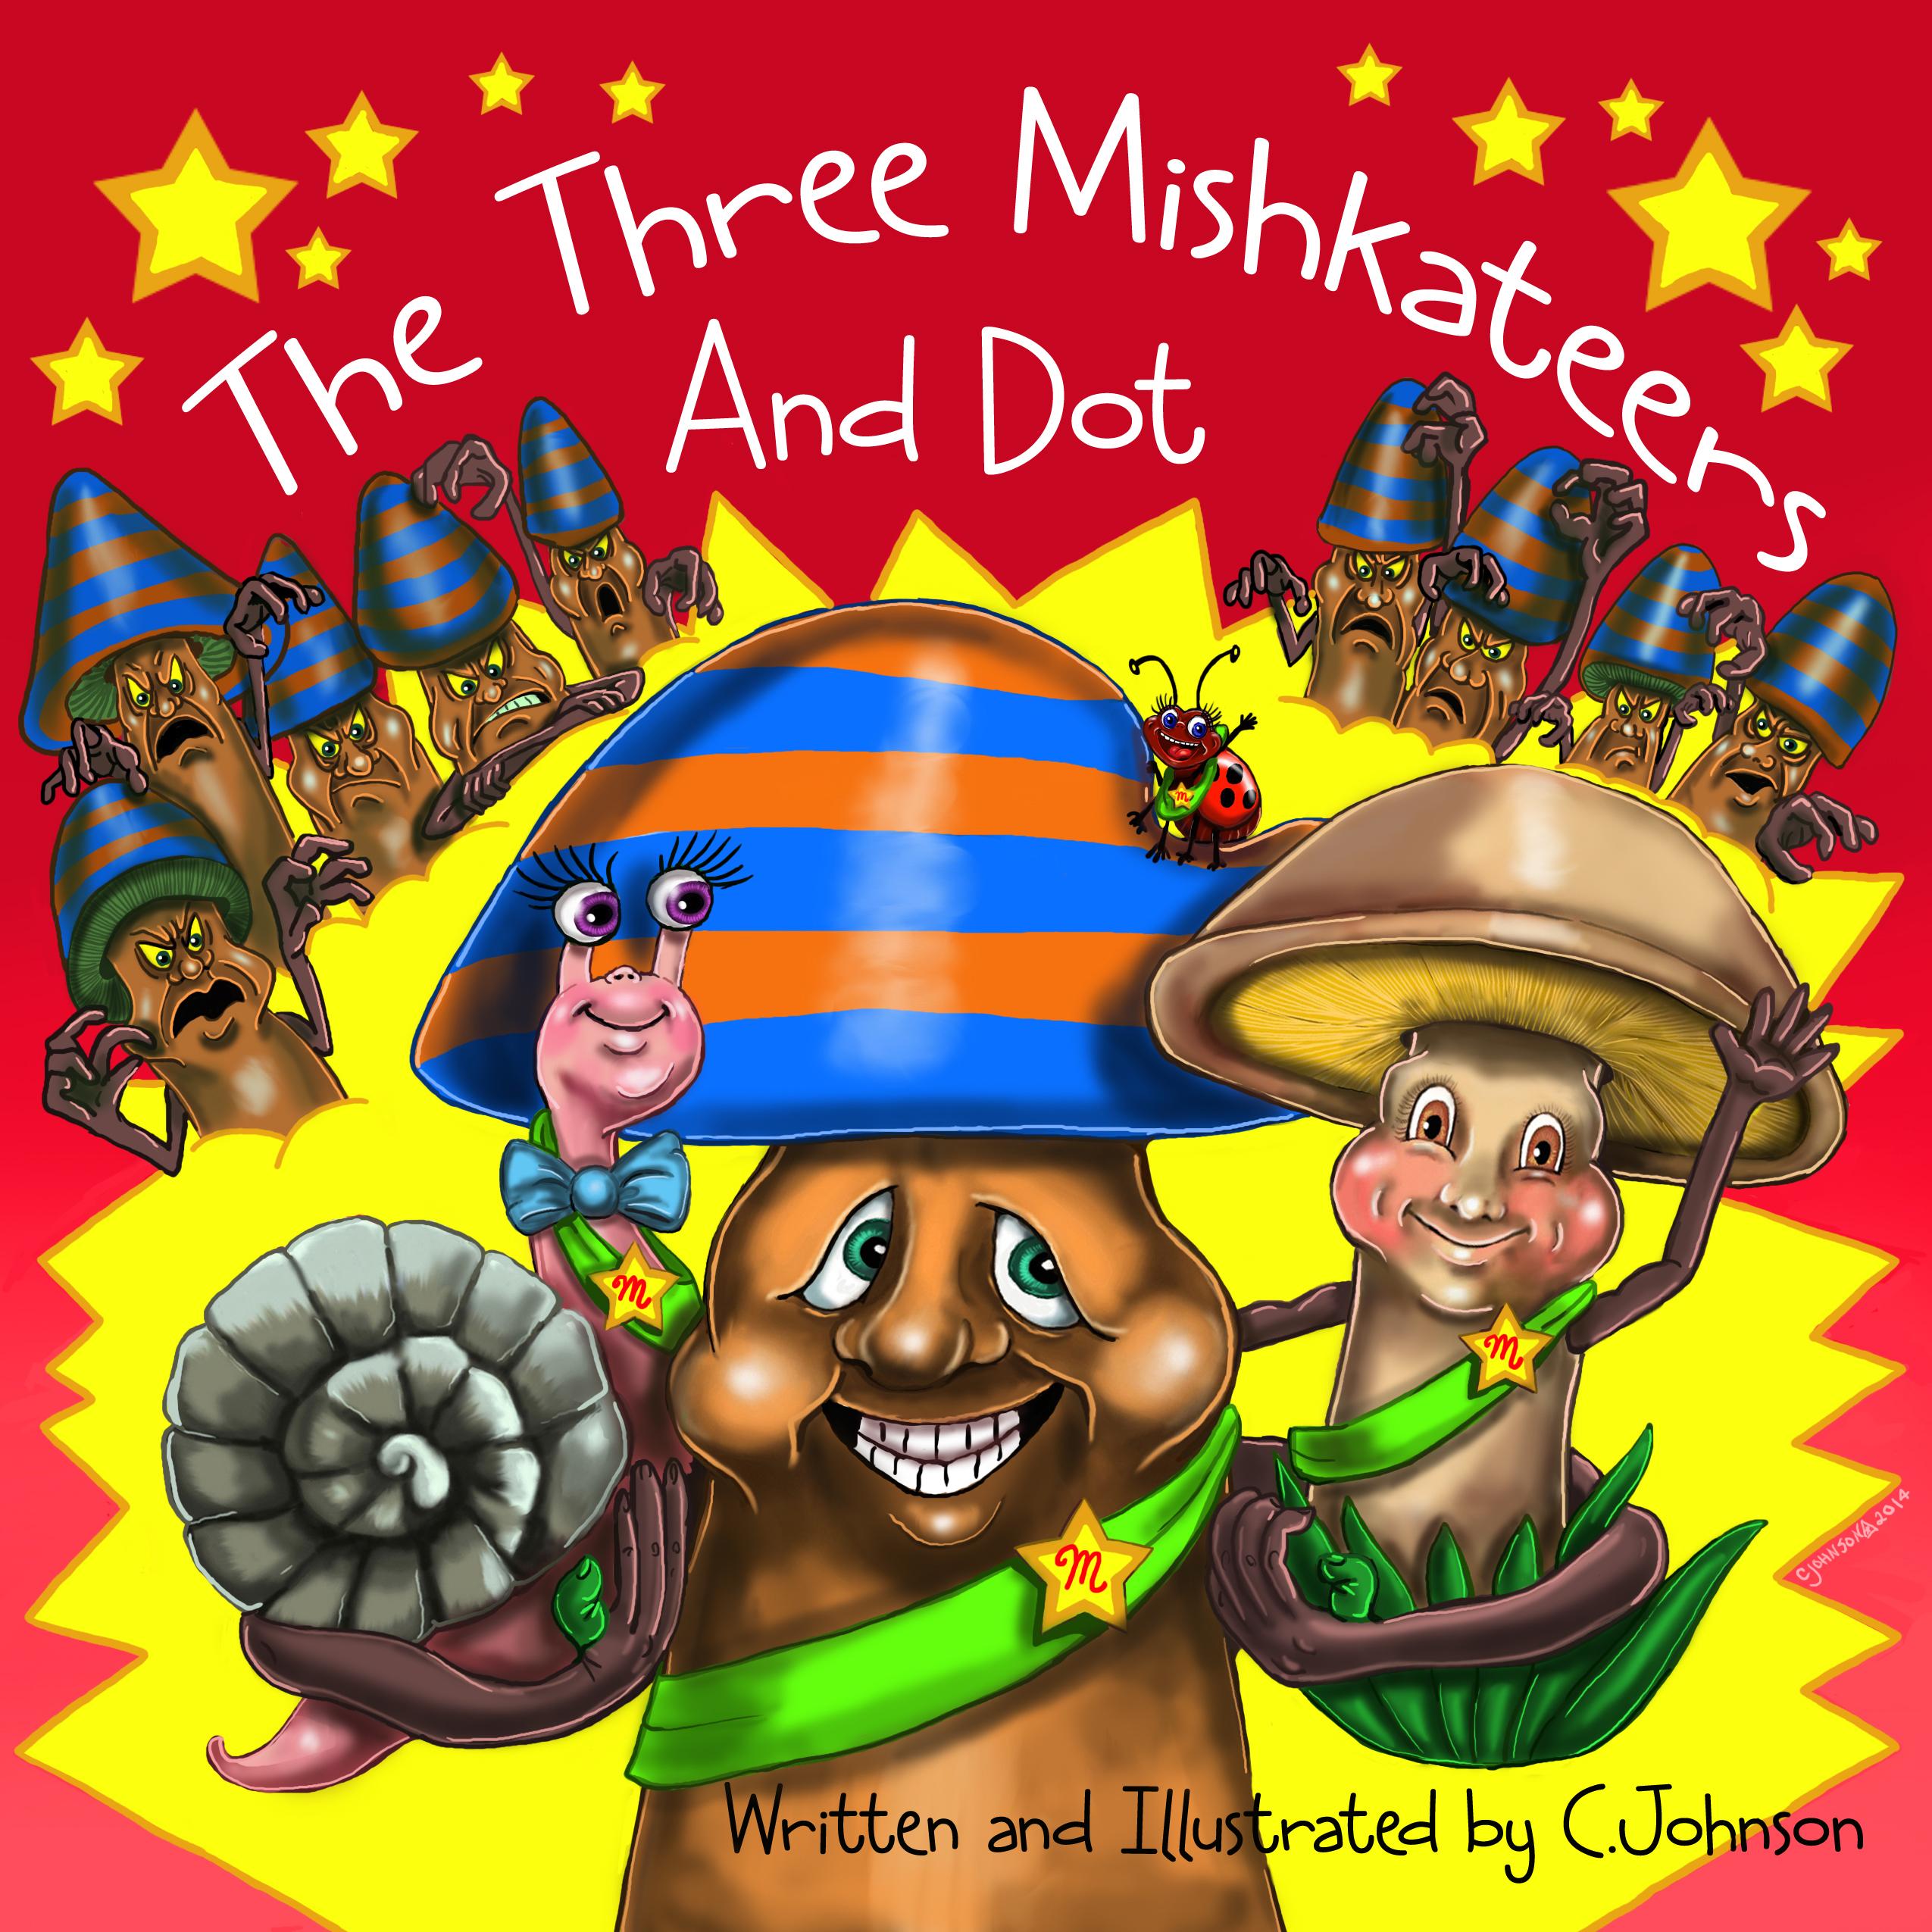 The Three Mishkateers